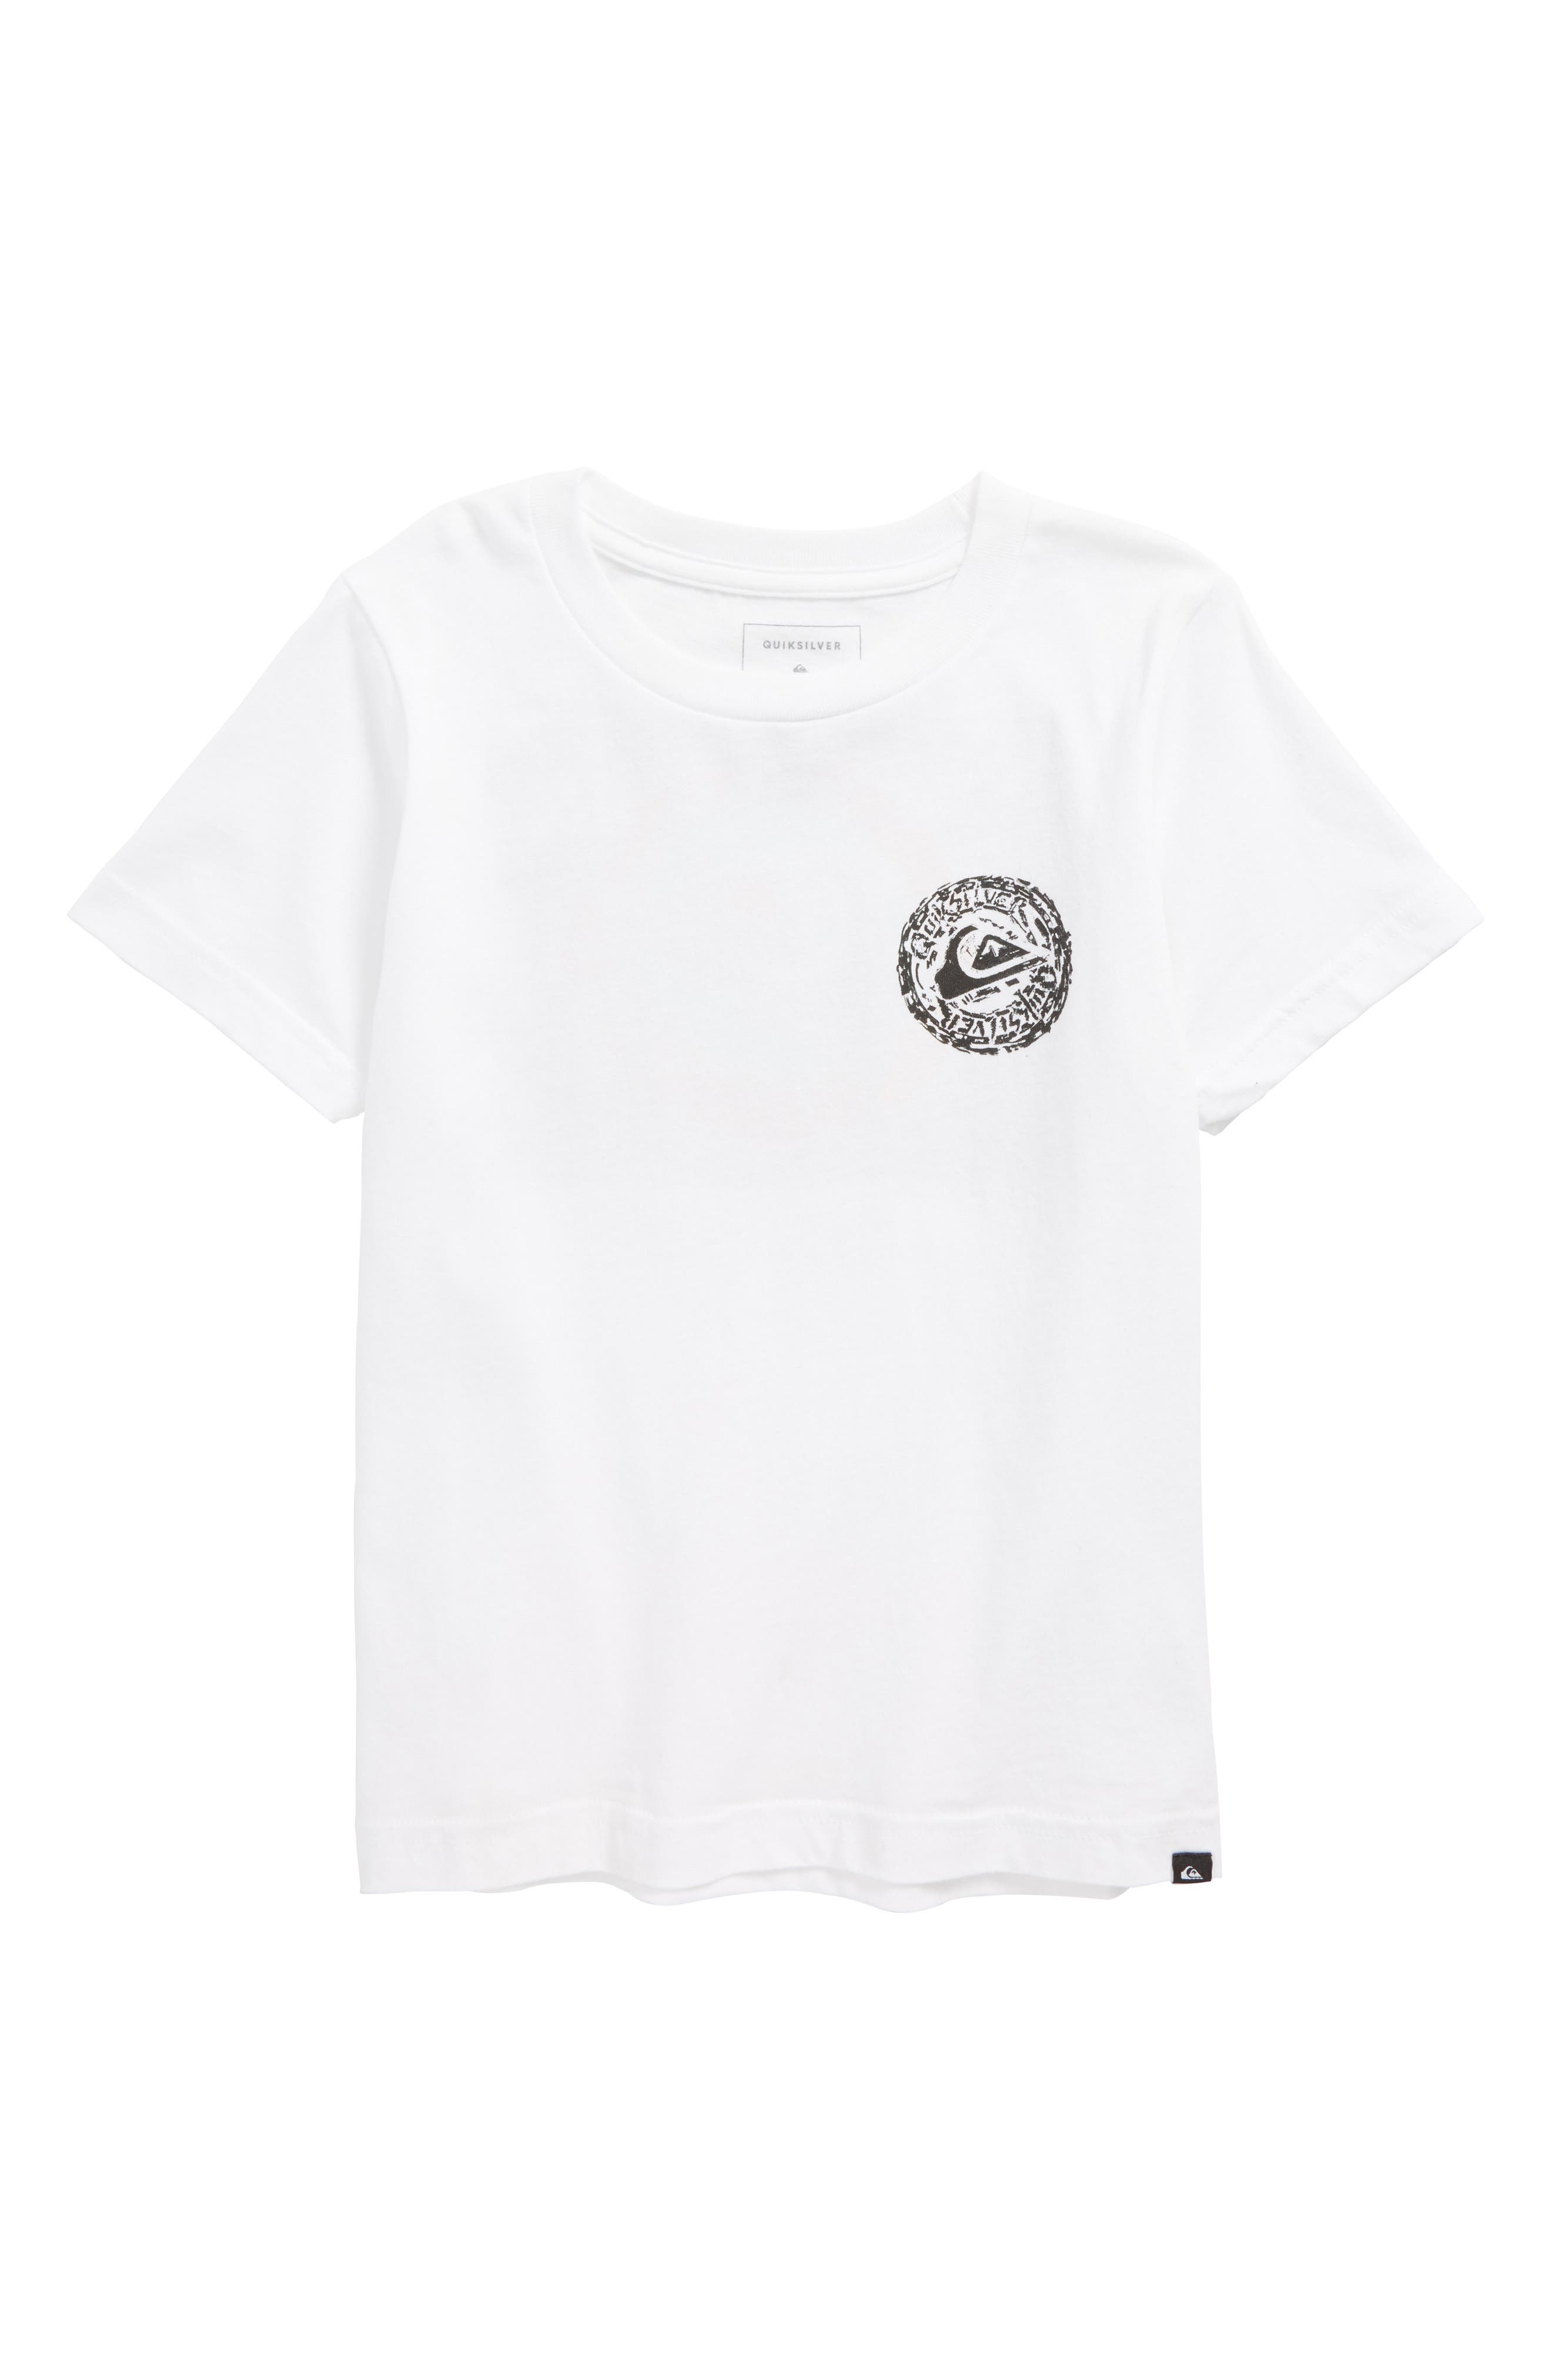 Elevens T-Shirt,                         Main,                         color, 101